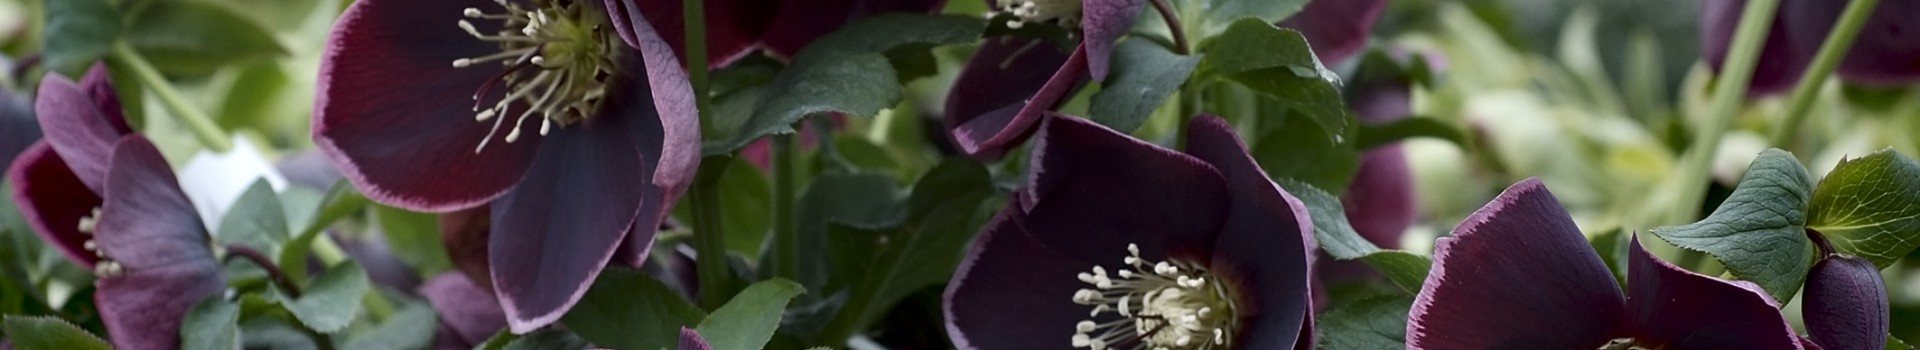 Helleborus x hybridus selections